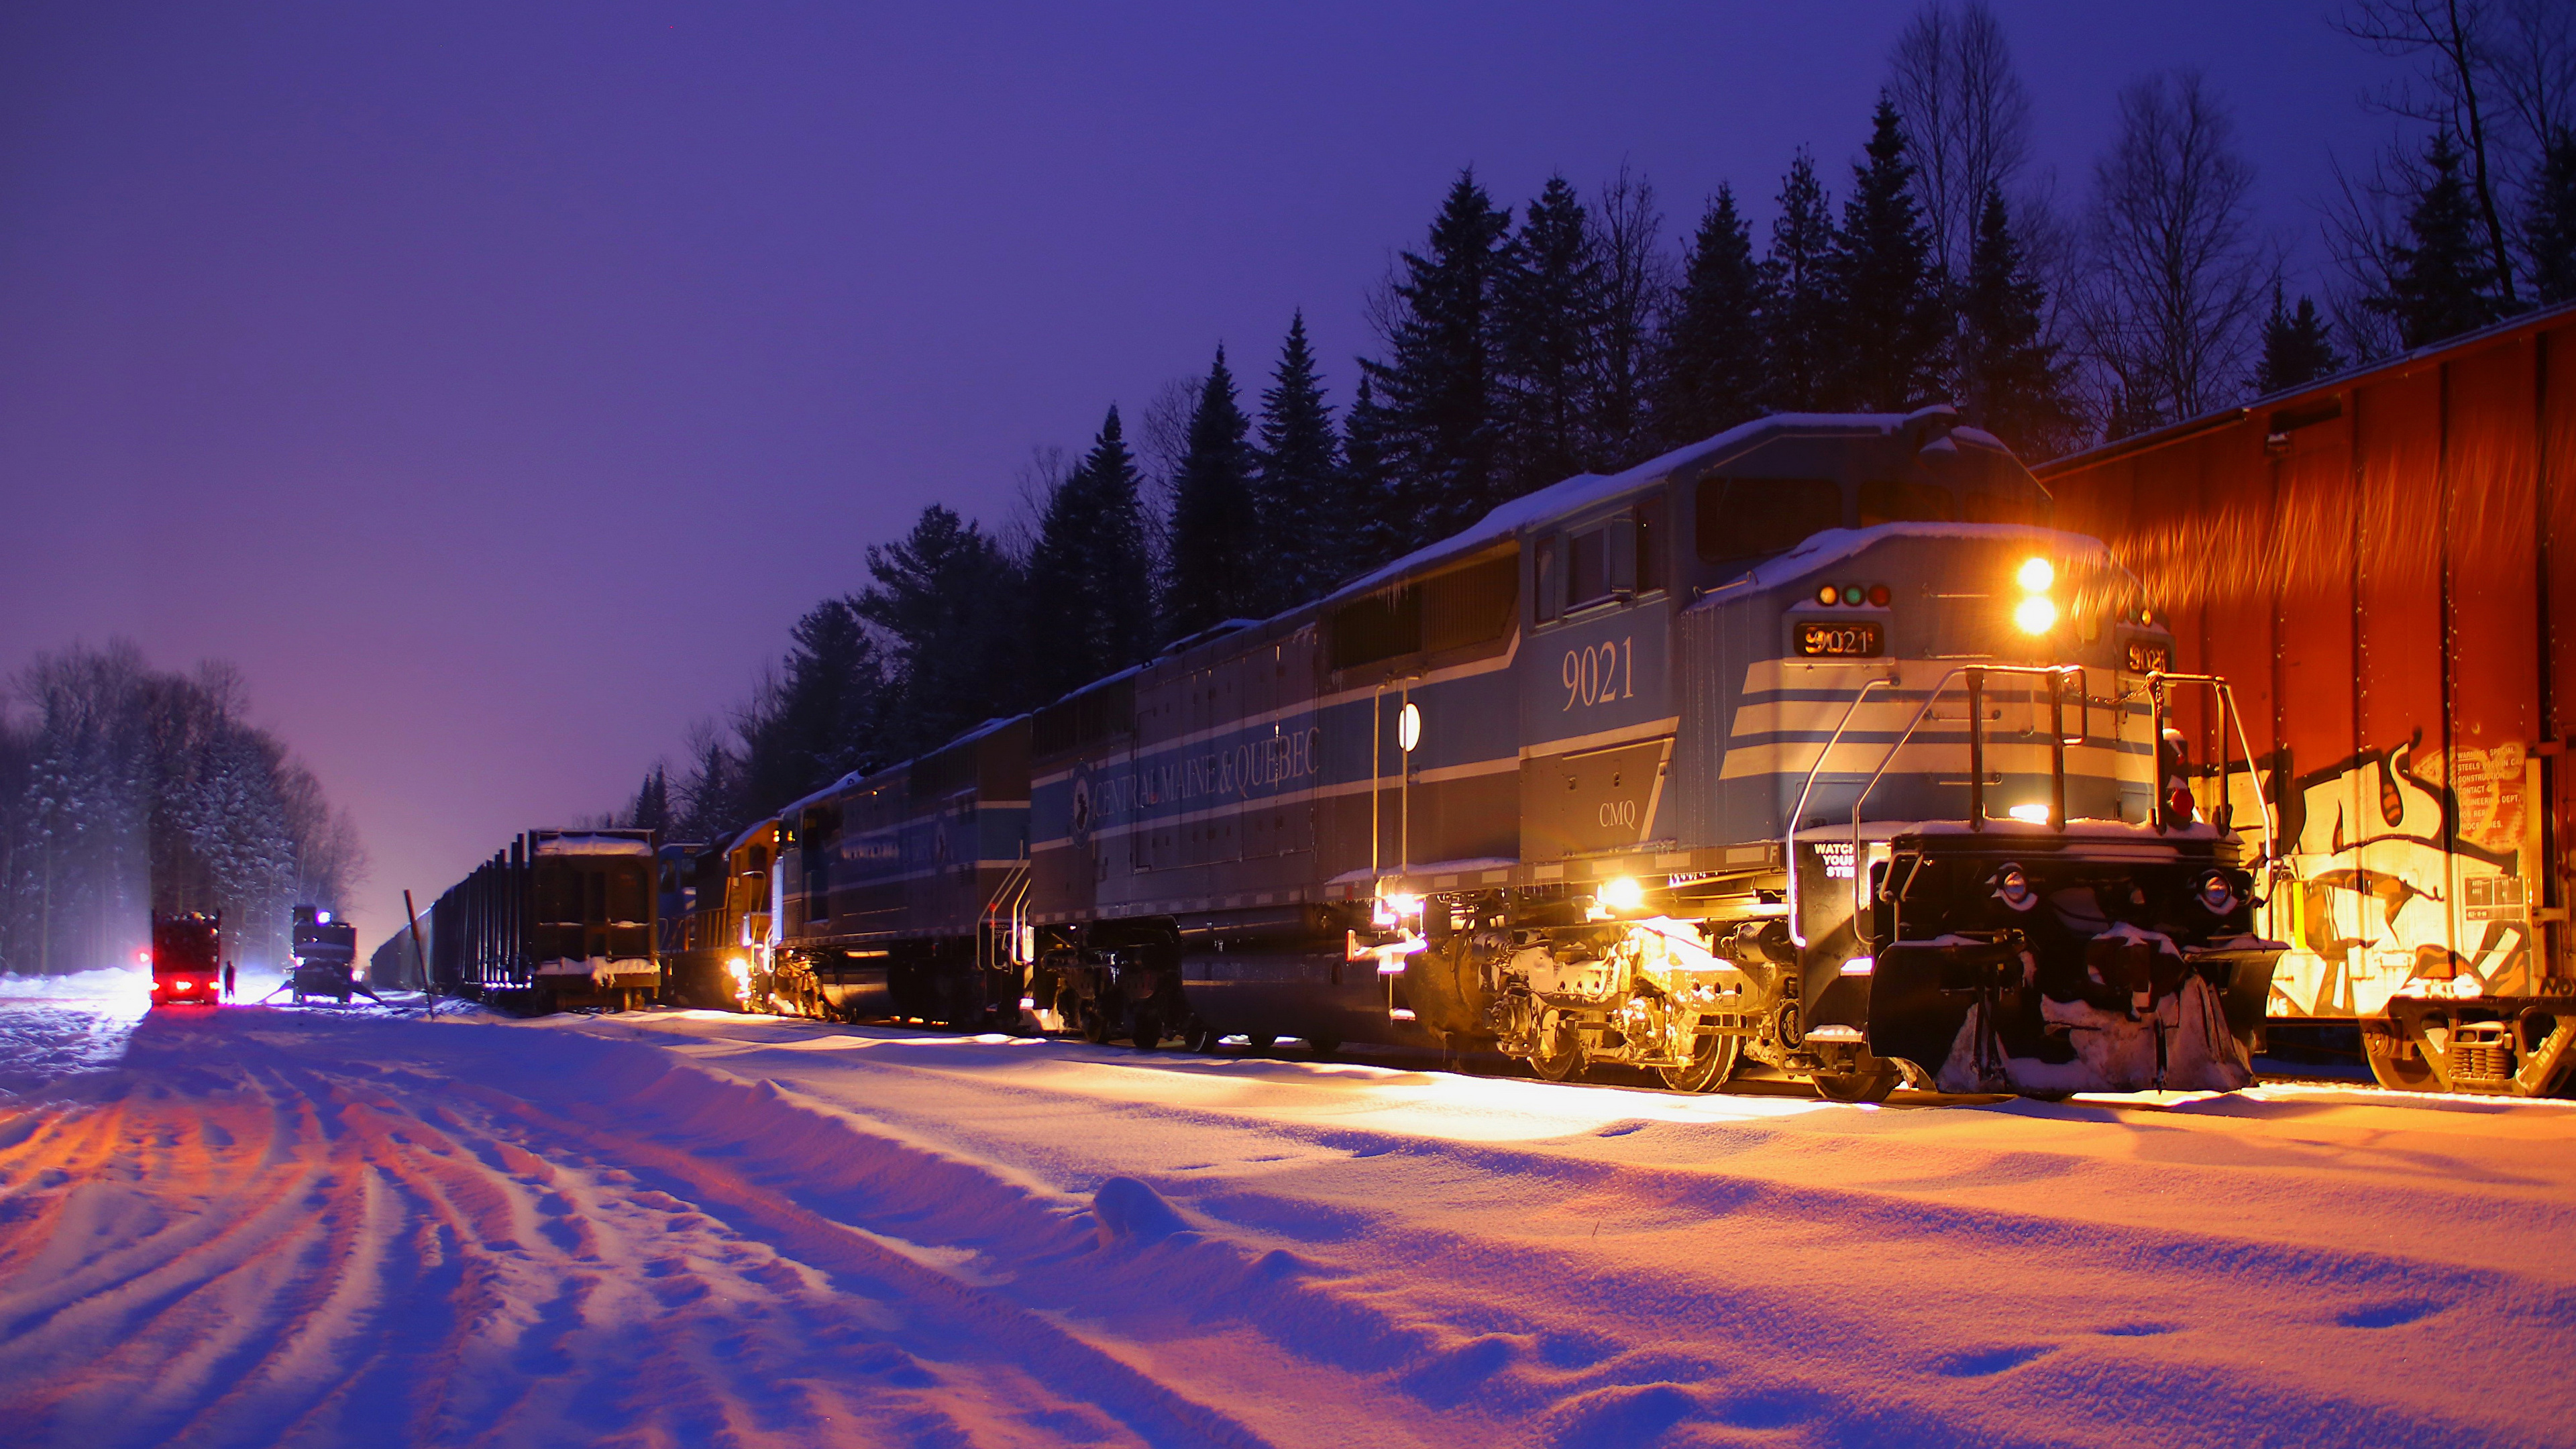 паровоз поезд снег зима дым the engine train snow winter smoke без смс